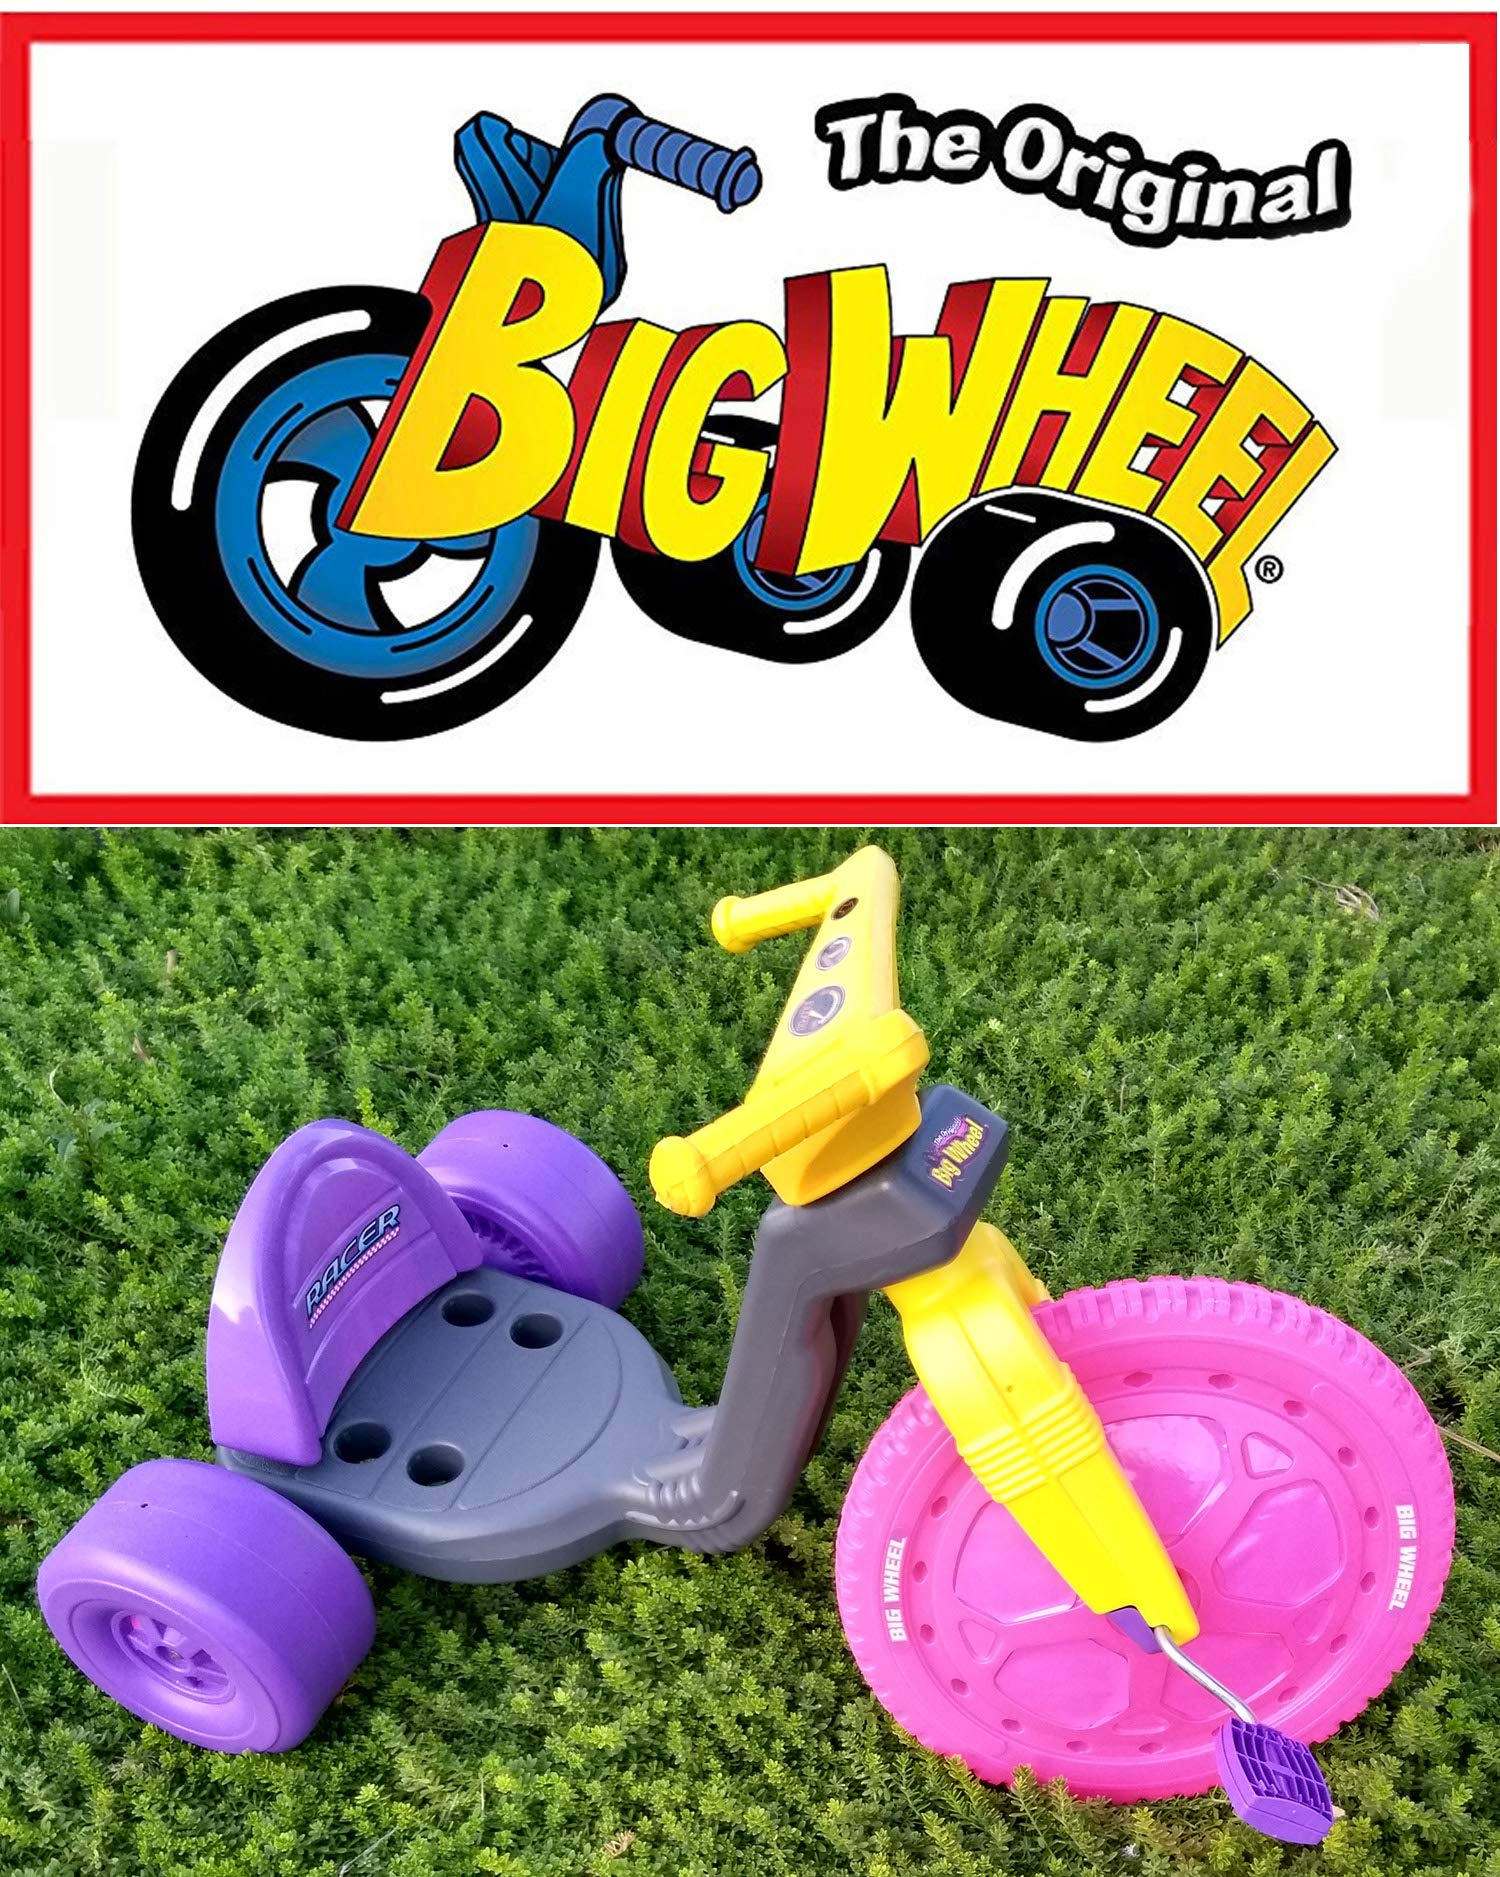 The Original Big Wheel Trike 16'' Gray, Pink & Purple with Pink Decals